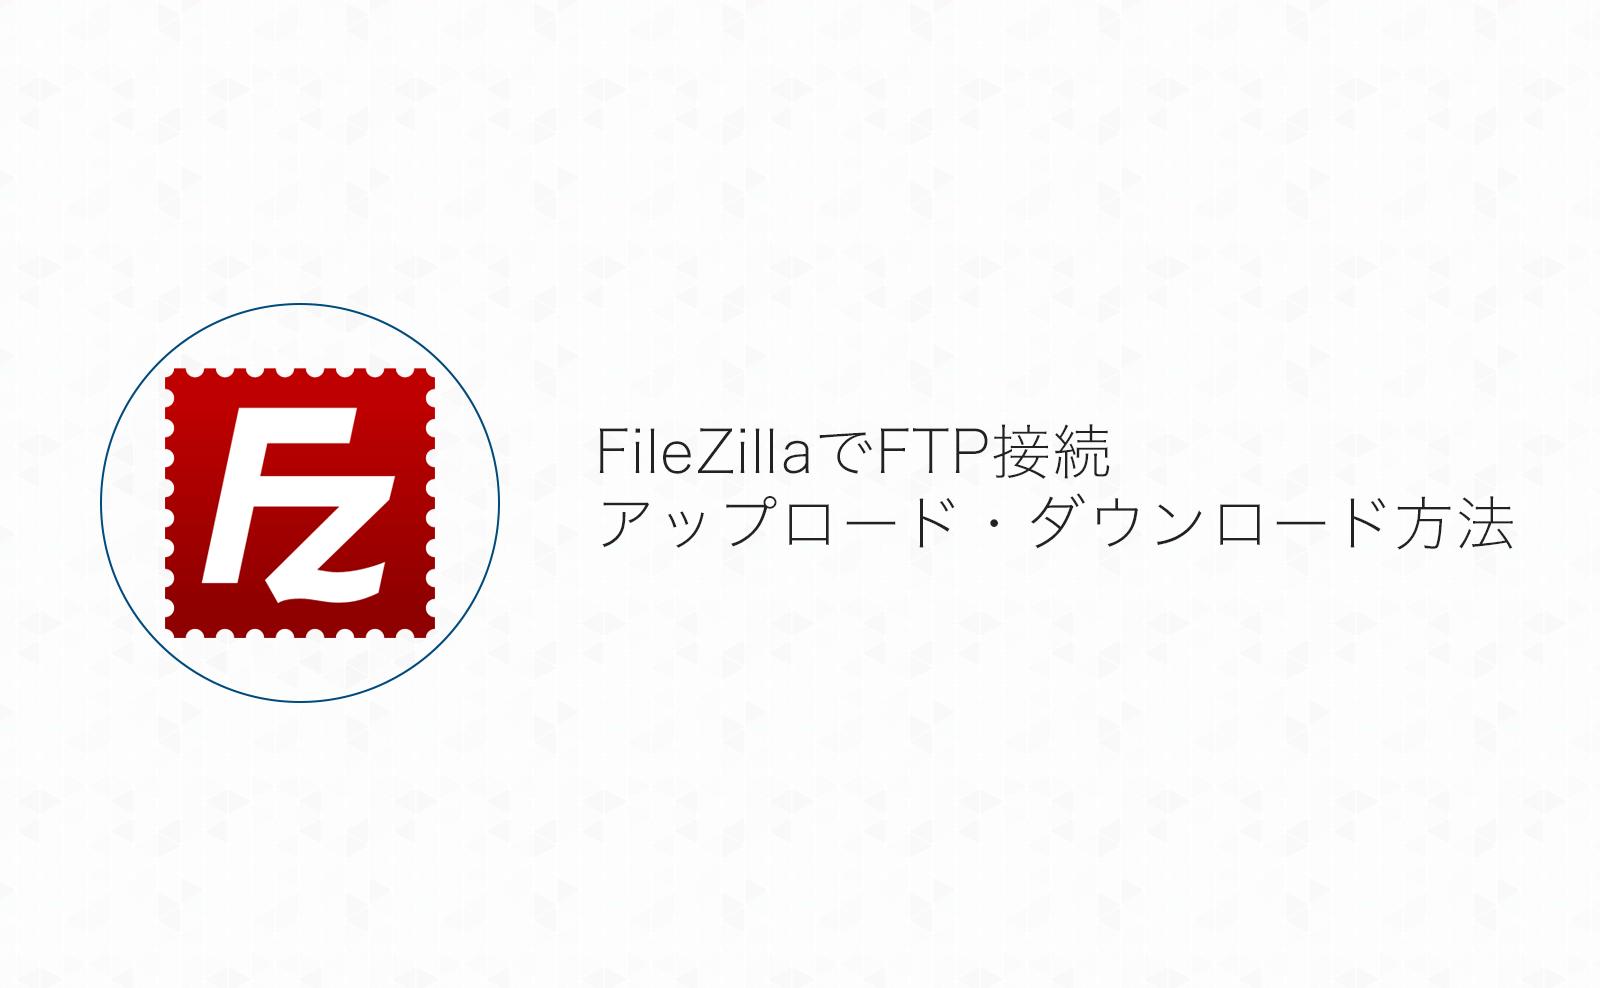 MacでもWindowsでも無料で使えるFTPソフト「FileZilla」の使い方!ファイルのアップロード・ダウンロード方法